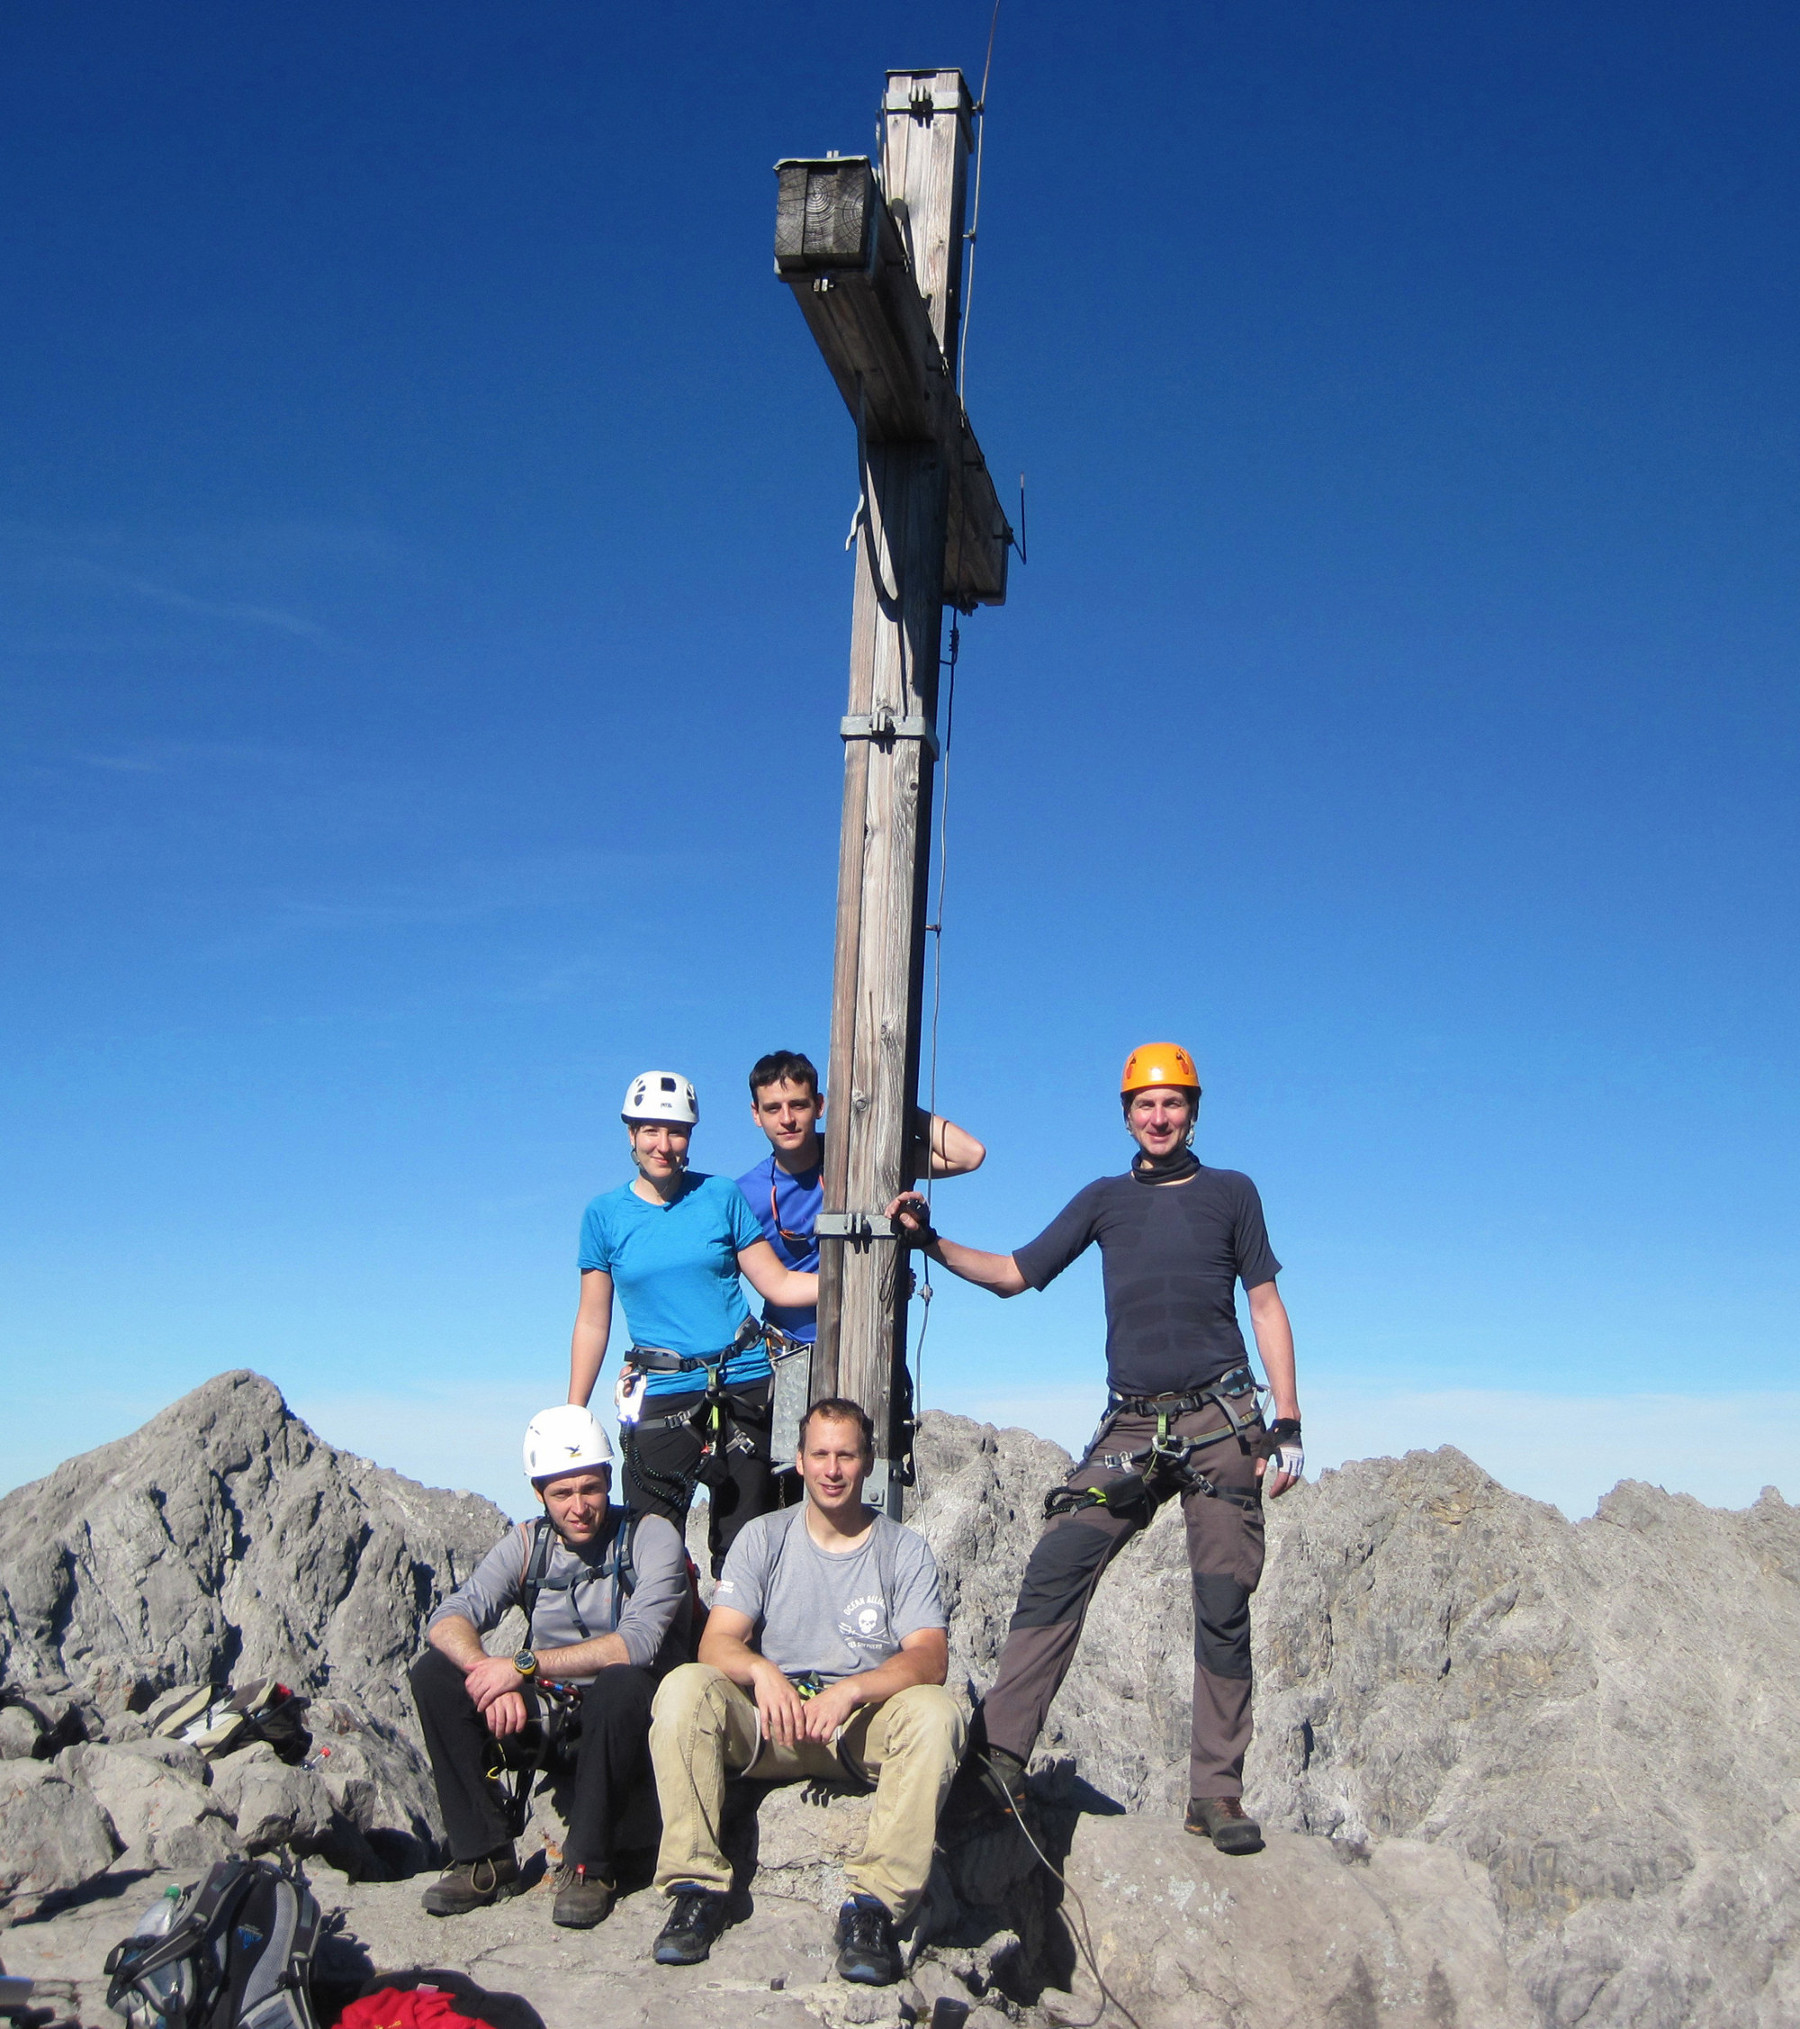 A csapat - Saulakopf 2517 m Saulakopf Klettersteig